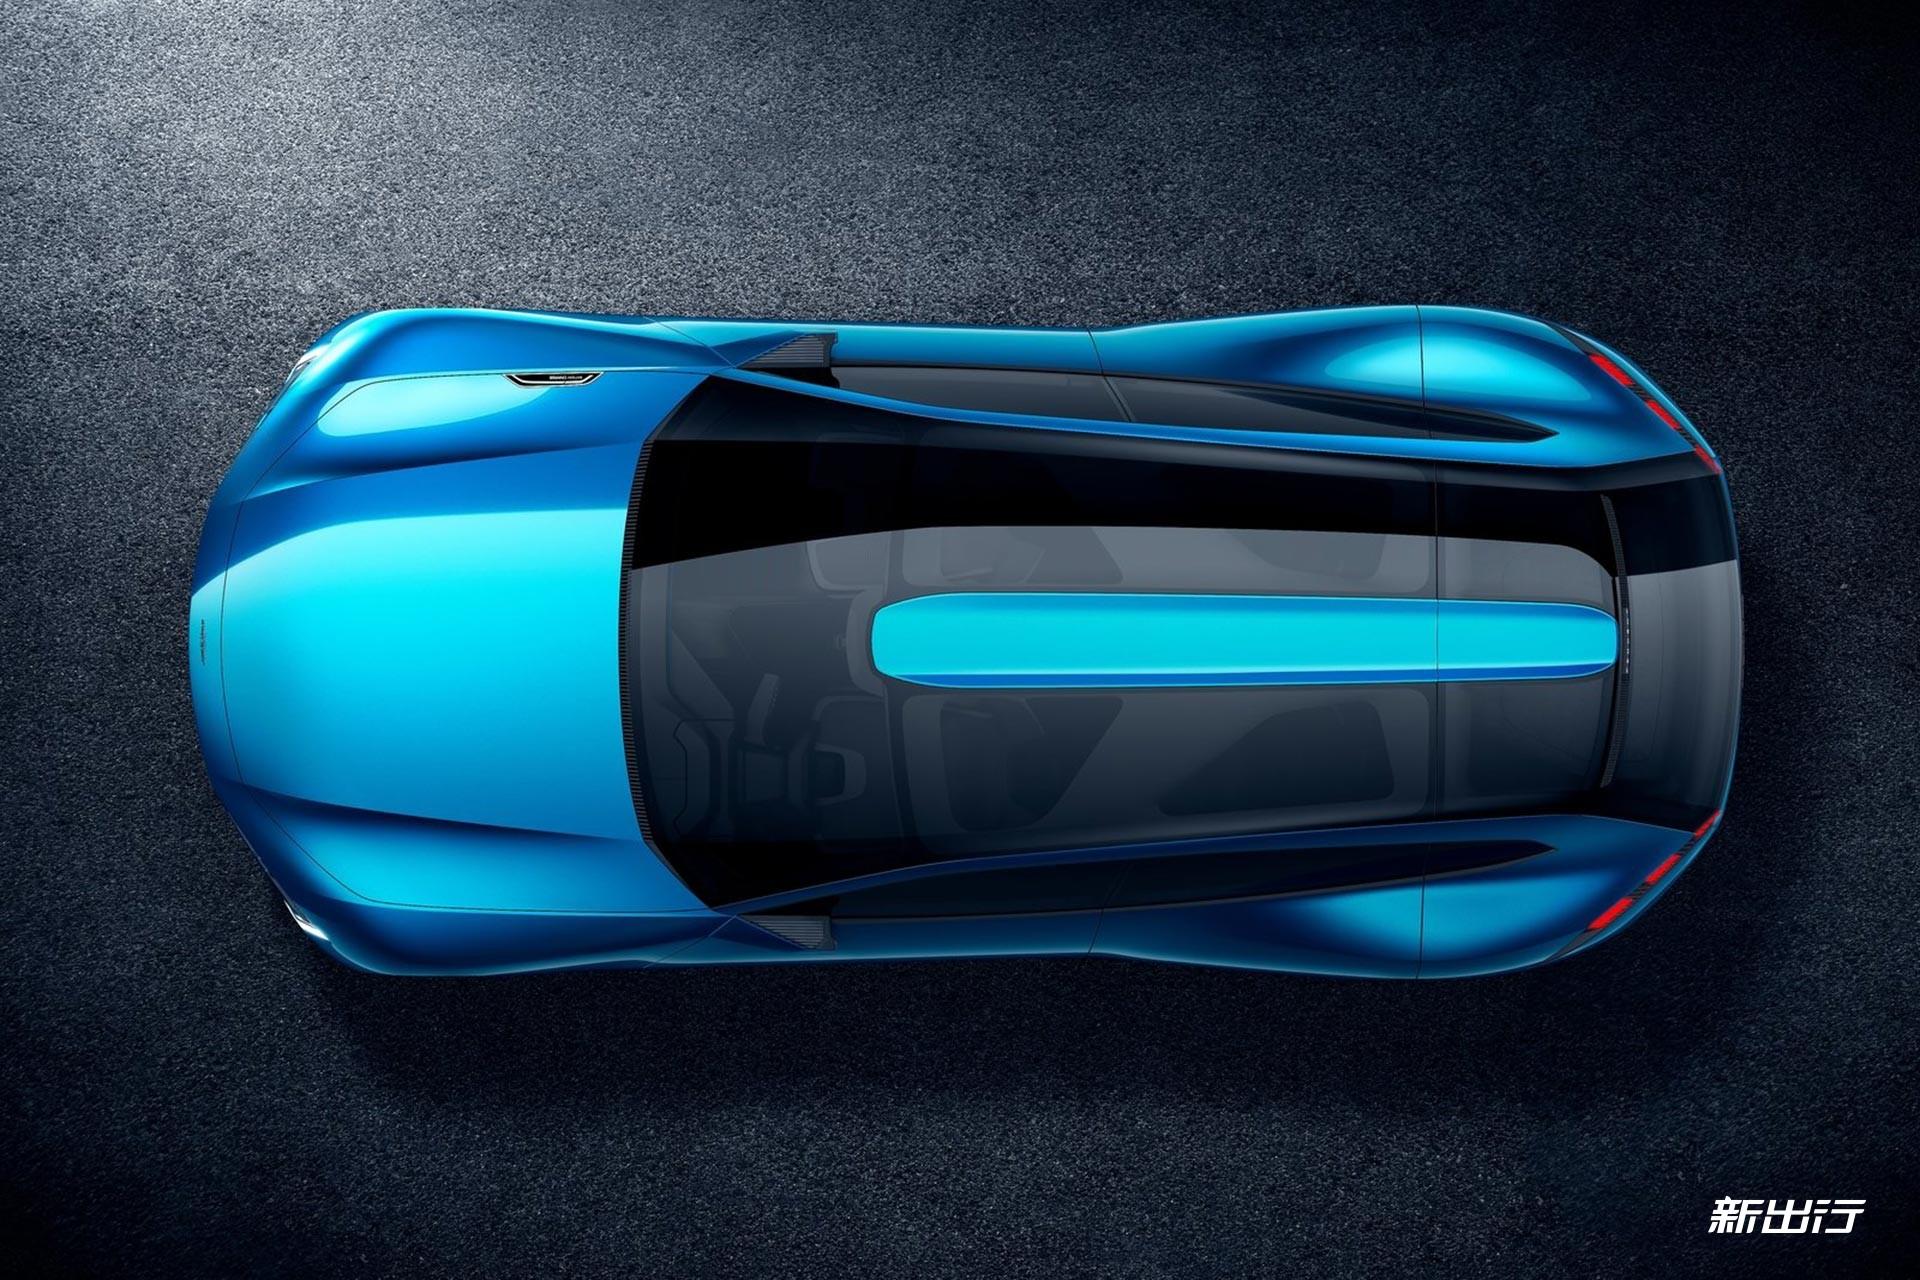 Peugeot-Instinct_Concept-2017-1600-1a.jpg